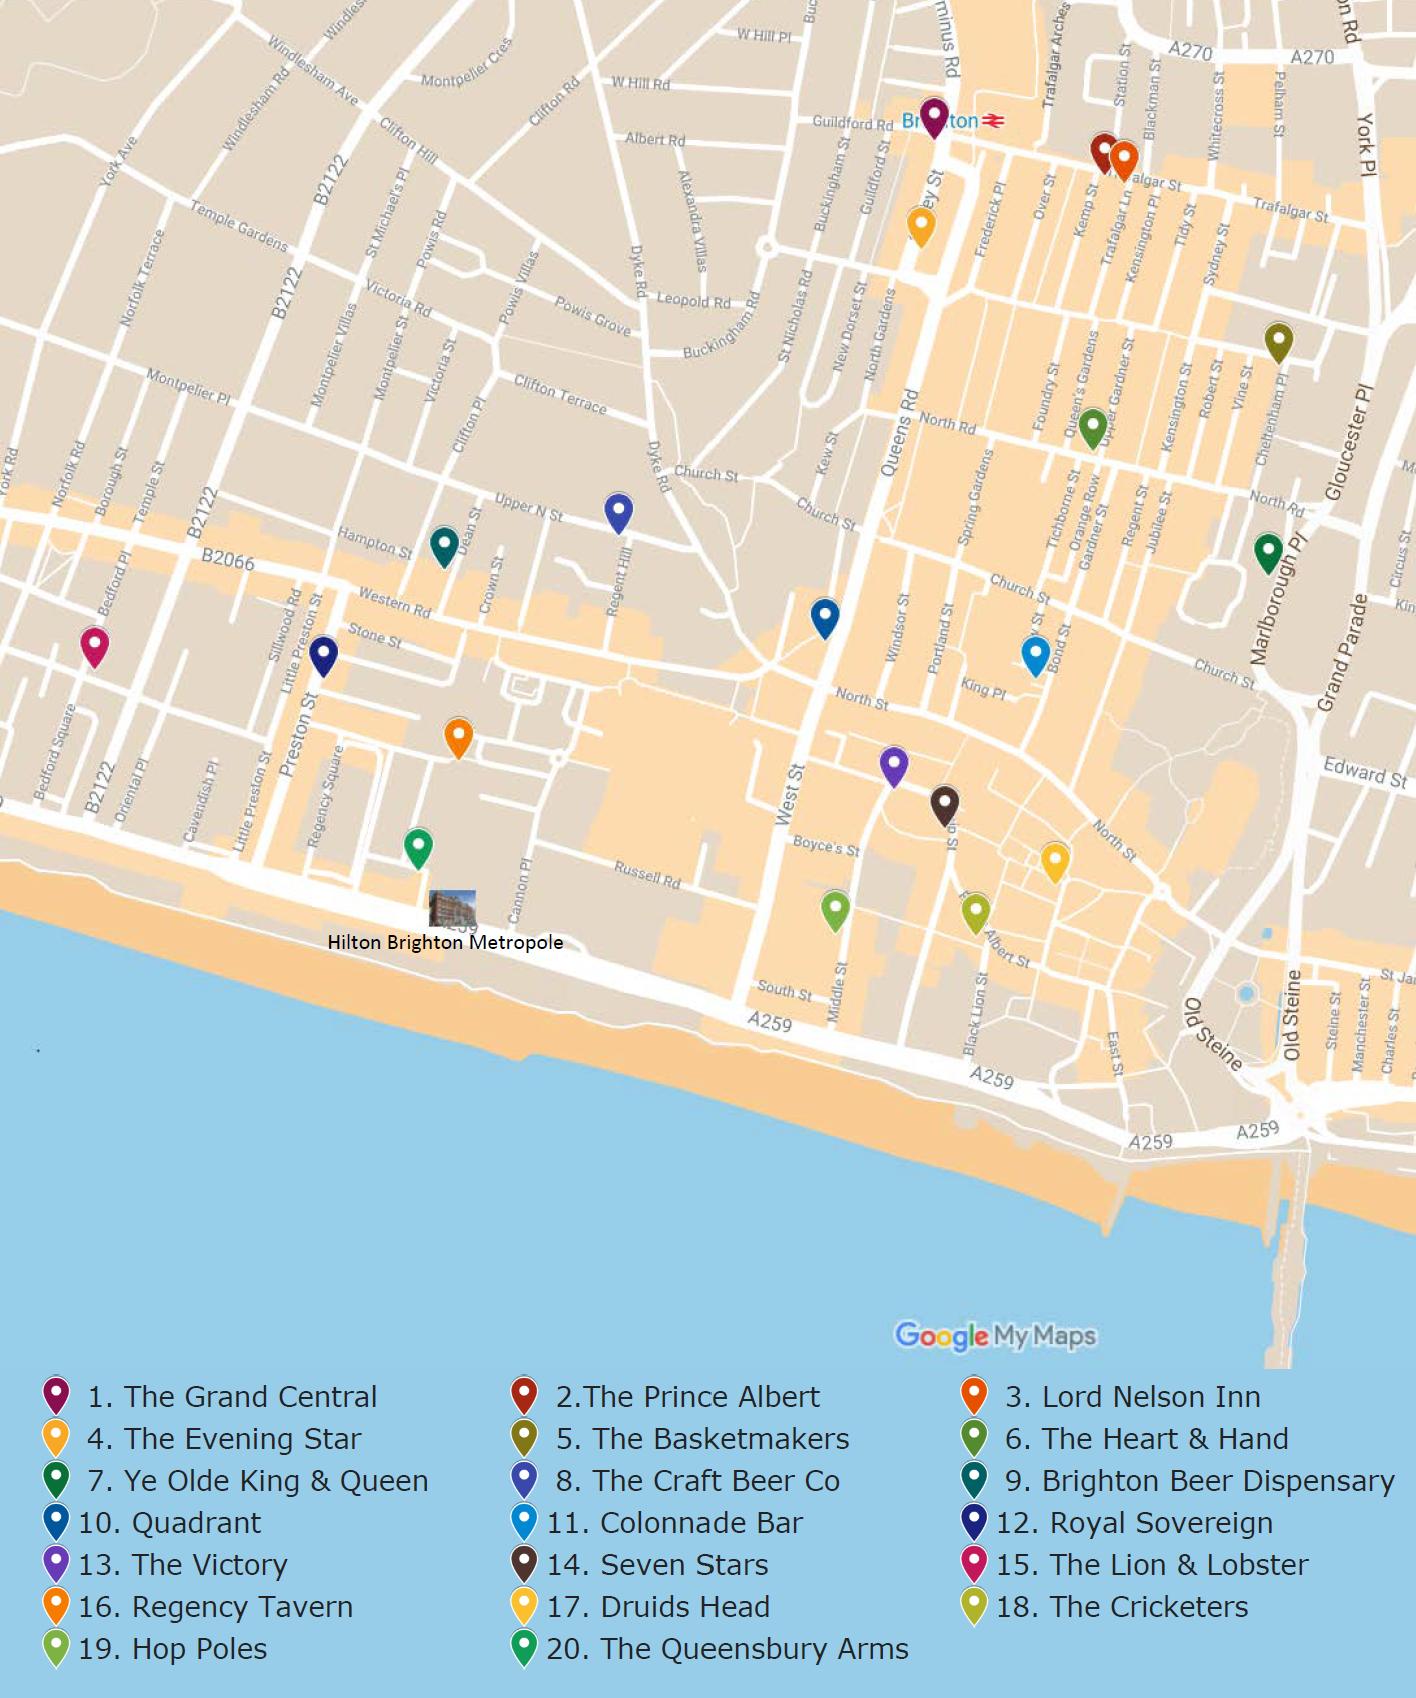 Brighton pubs Google map